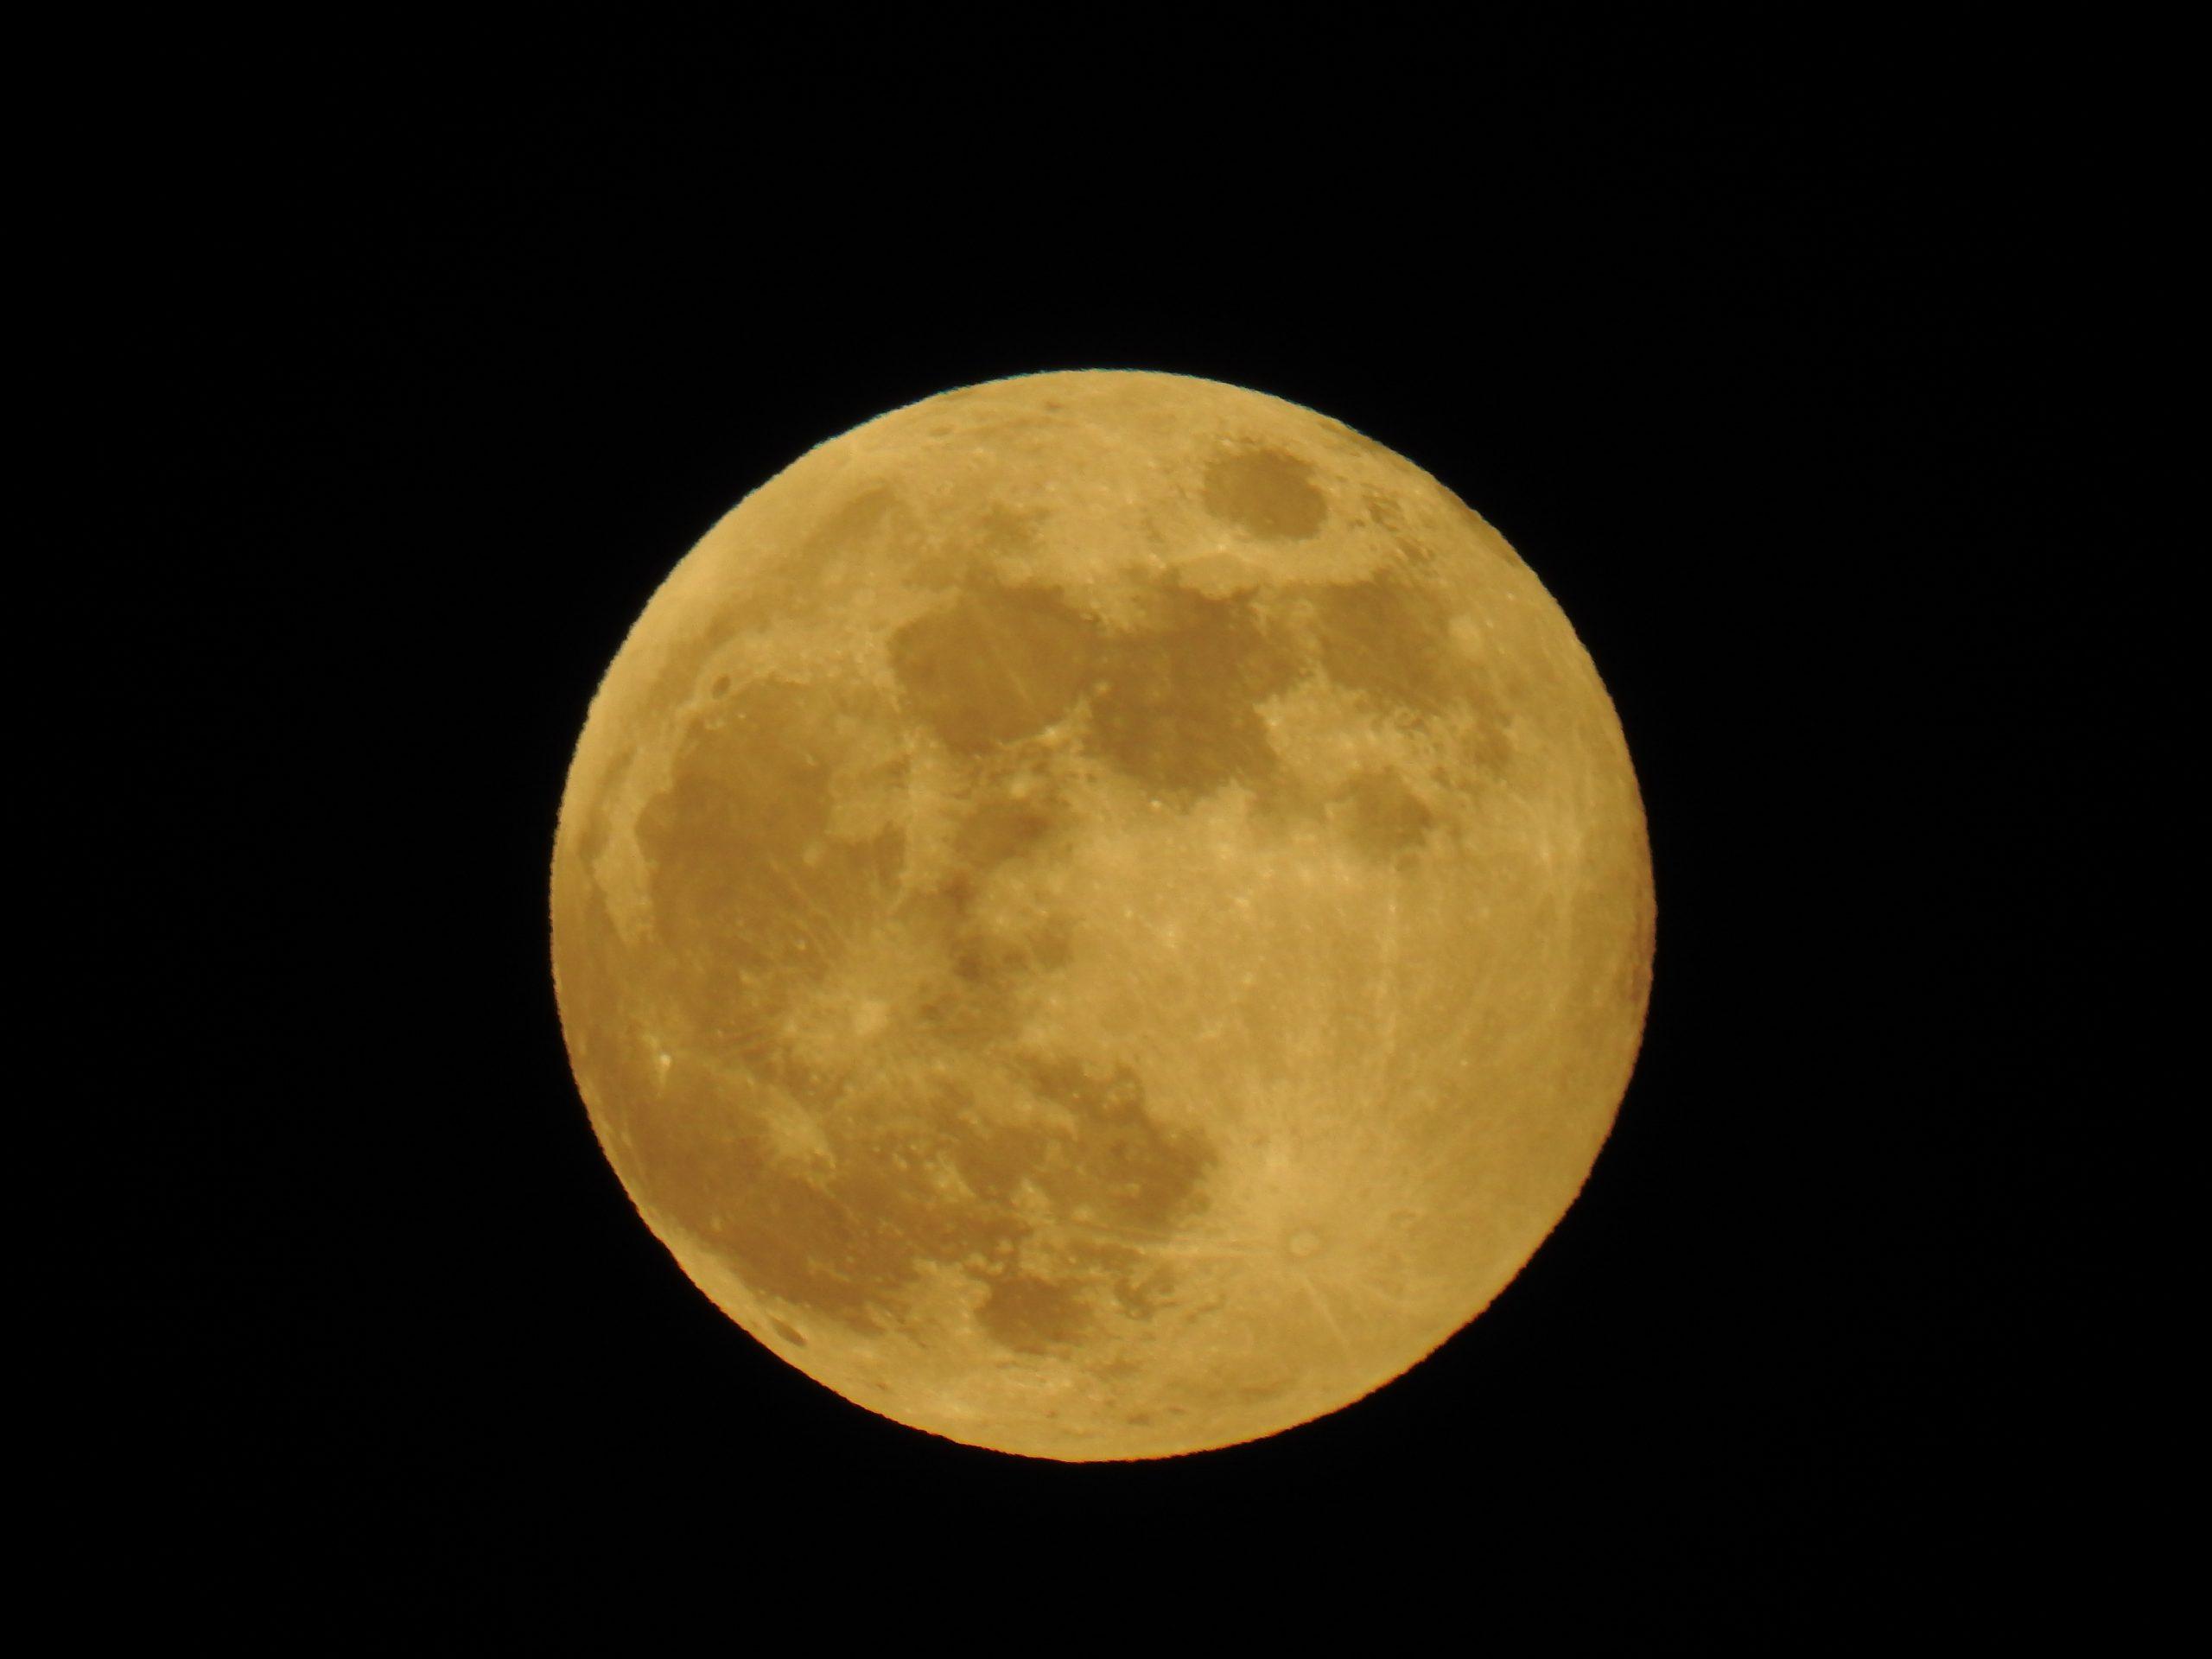 Luna de Fresa. Eclipse penumbral en directo